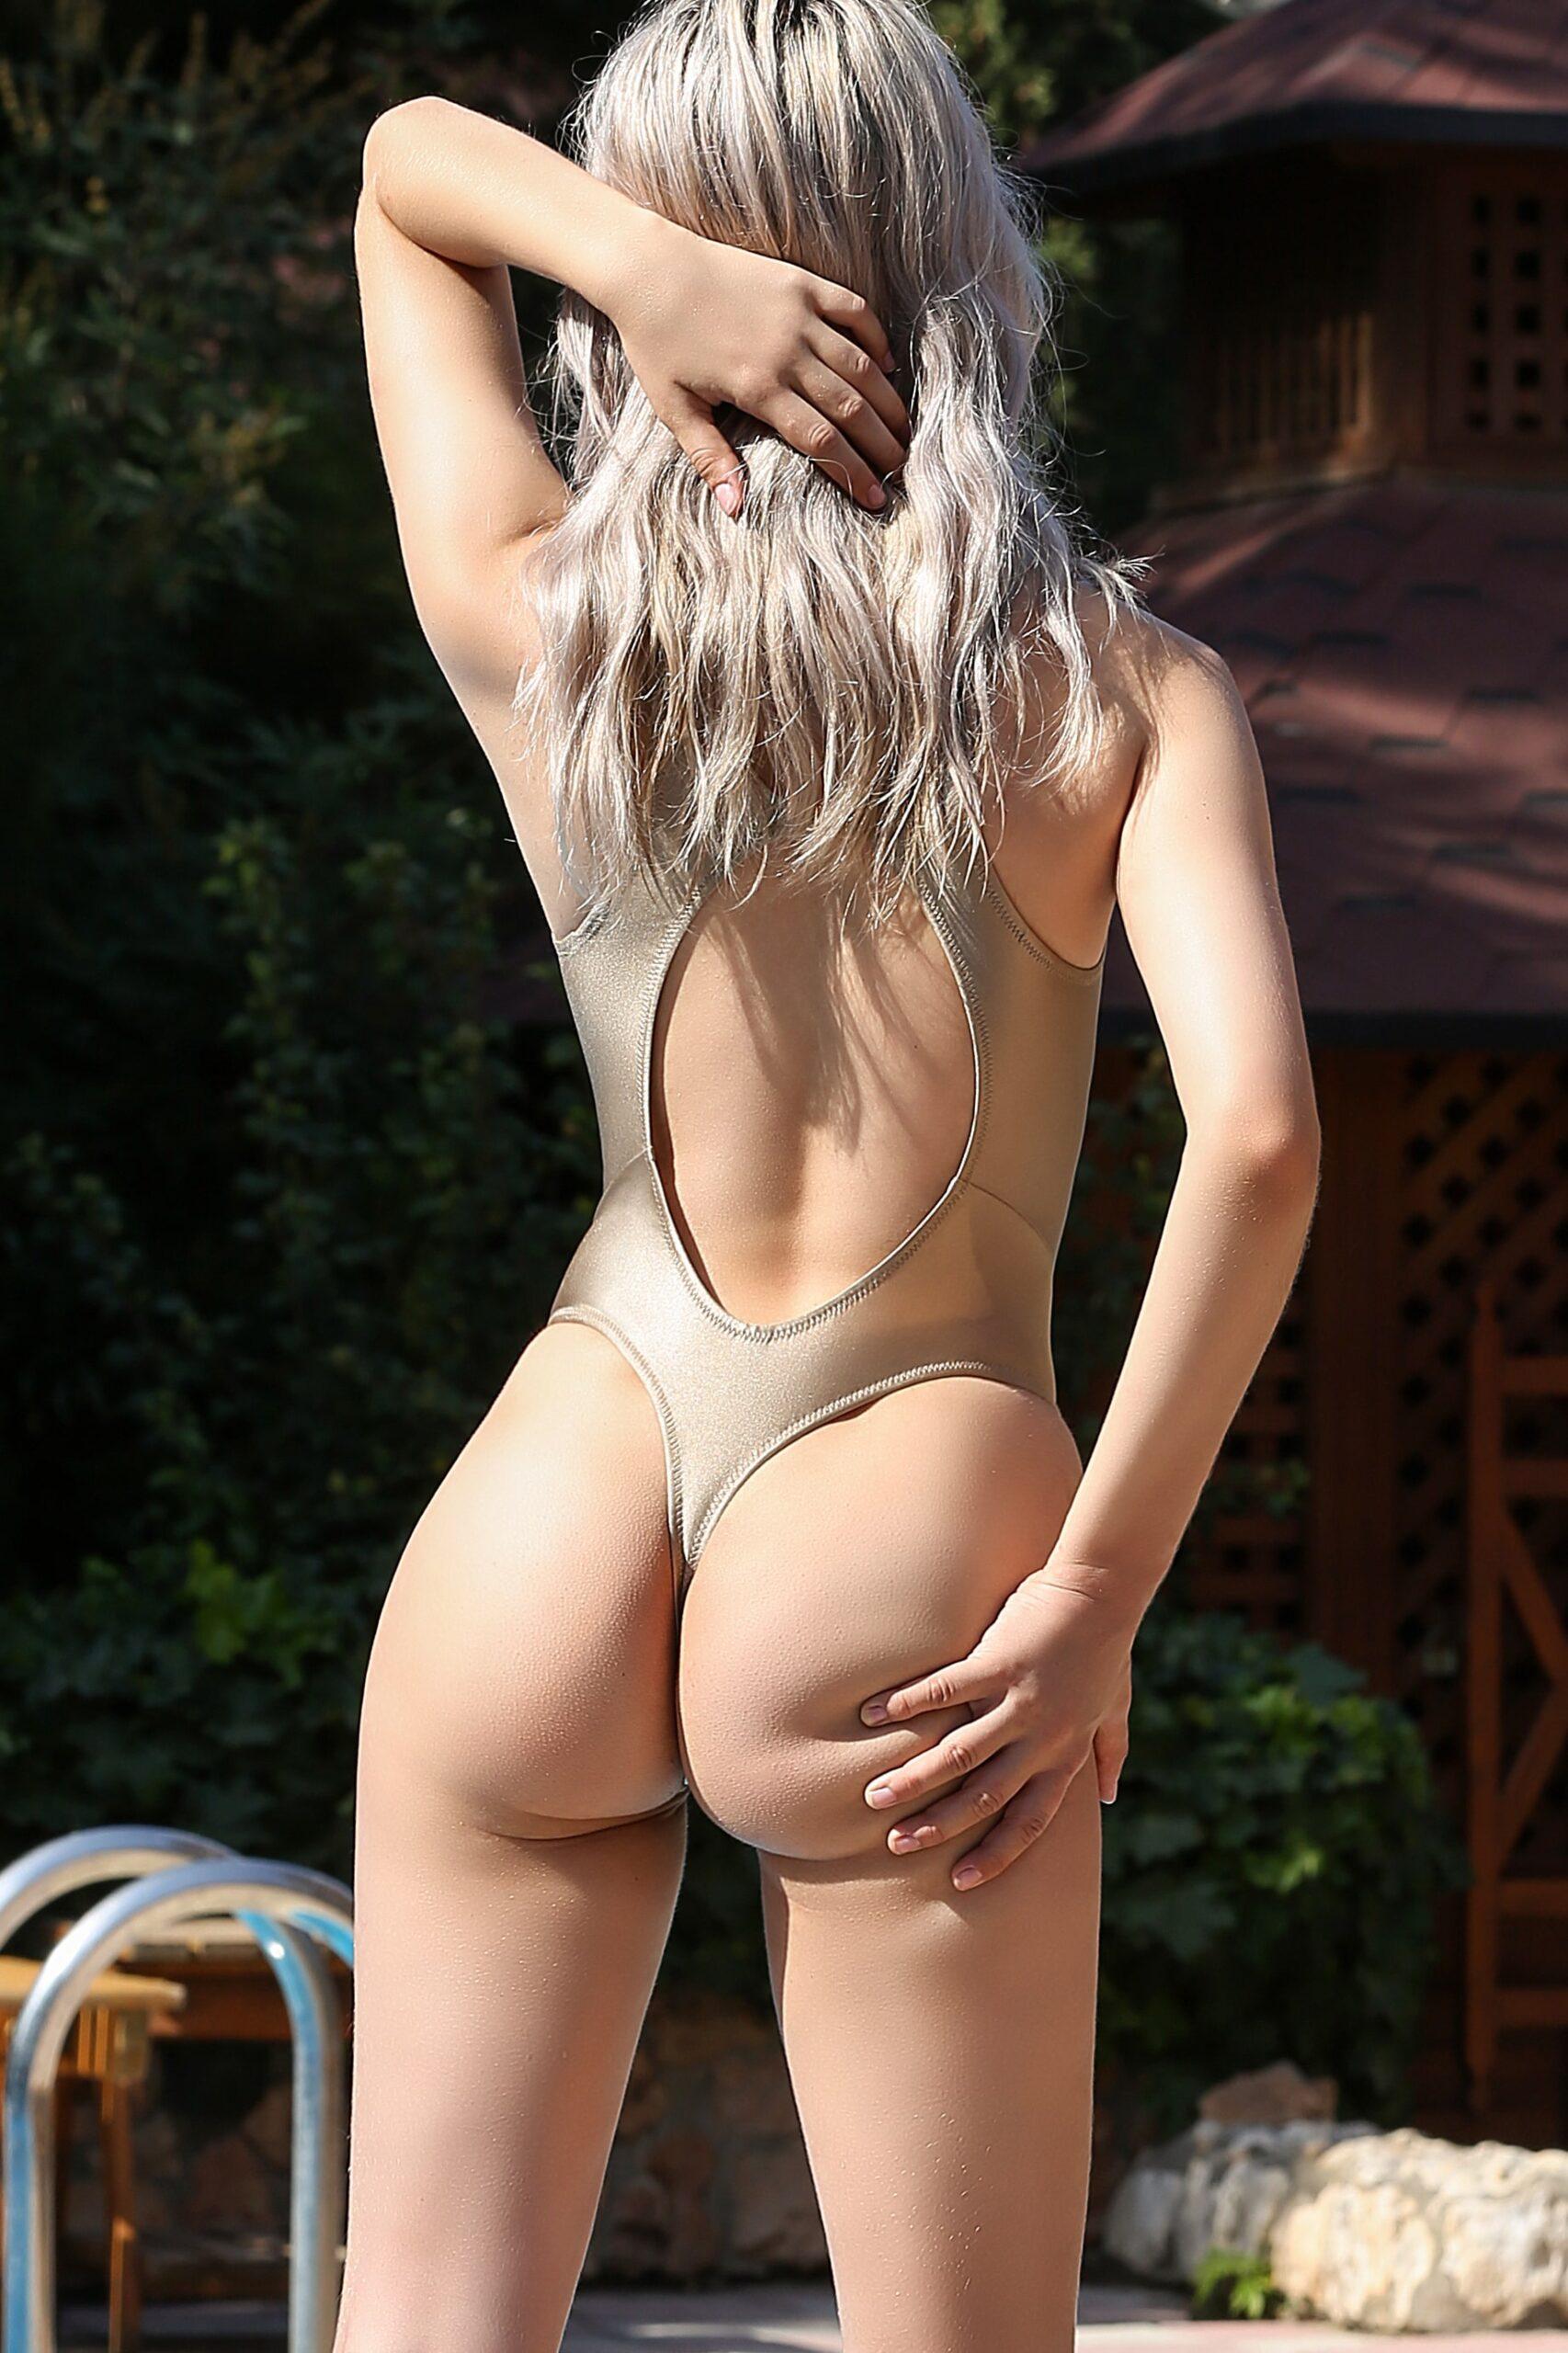 Sexy sheer when wet rave thong bodysuit. Hot see through high cut leg one piece swimwear monokini. Cute cheeky designer women swimsuit.